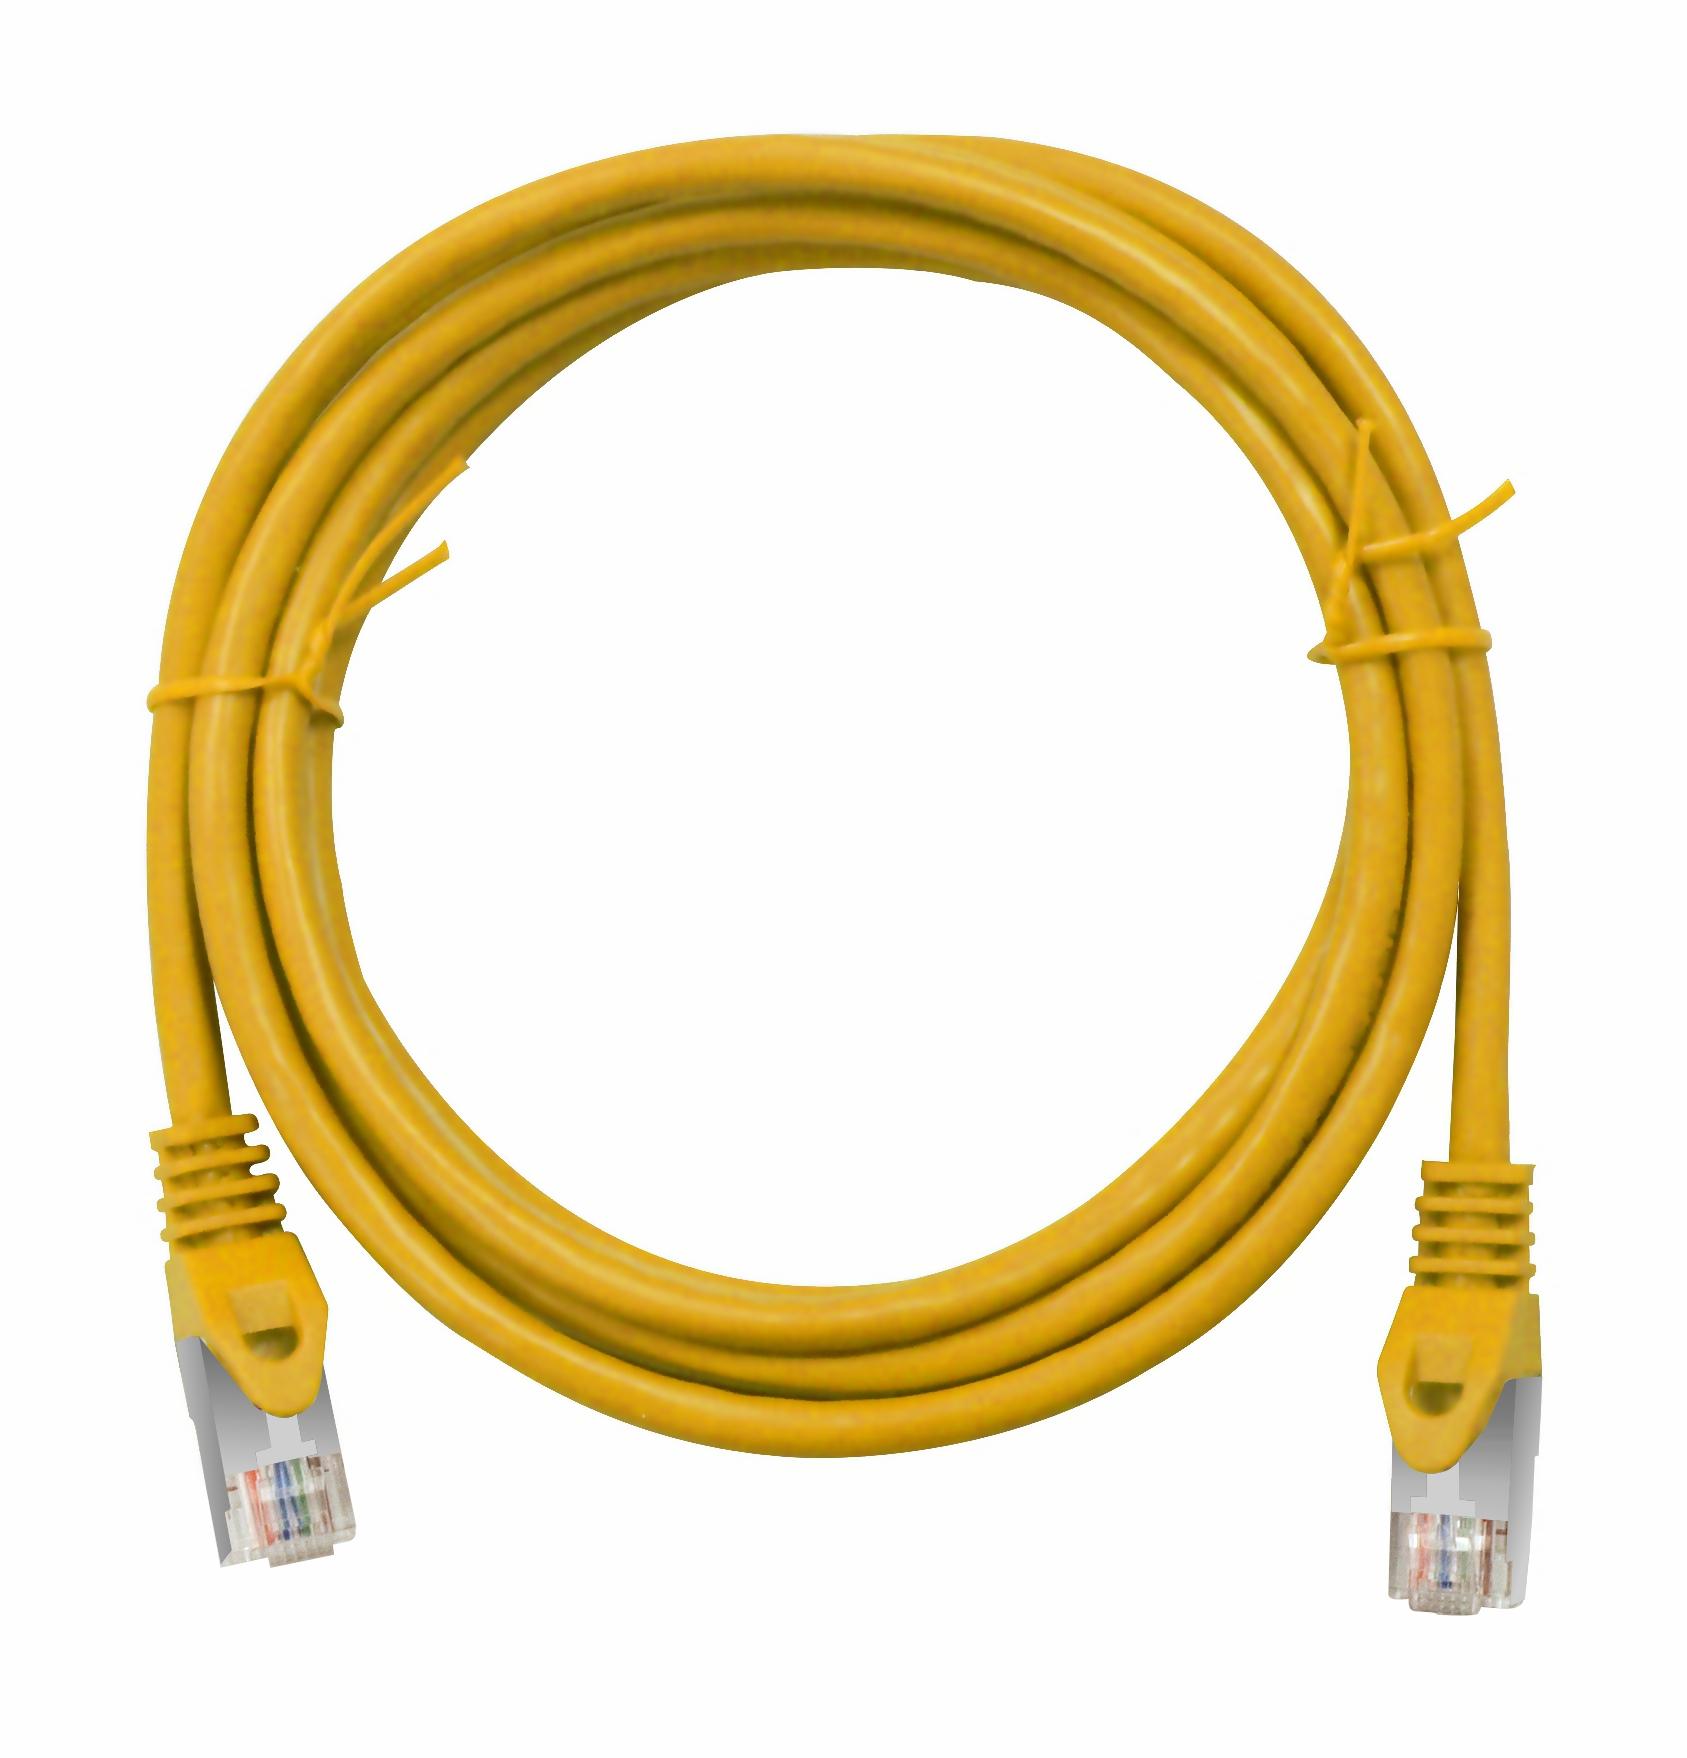 1 Stk Patchkabel RJ45 geschirmt Cat.5e, PVC, gelb, 7,0m H5GLY07K0Y